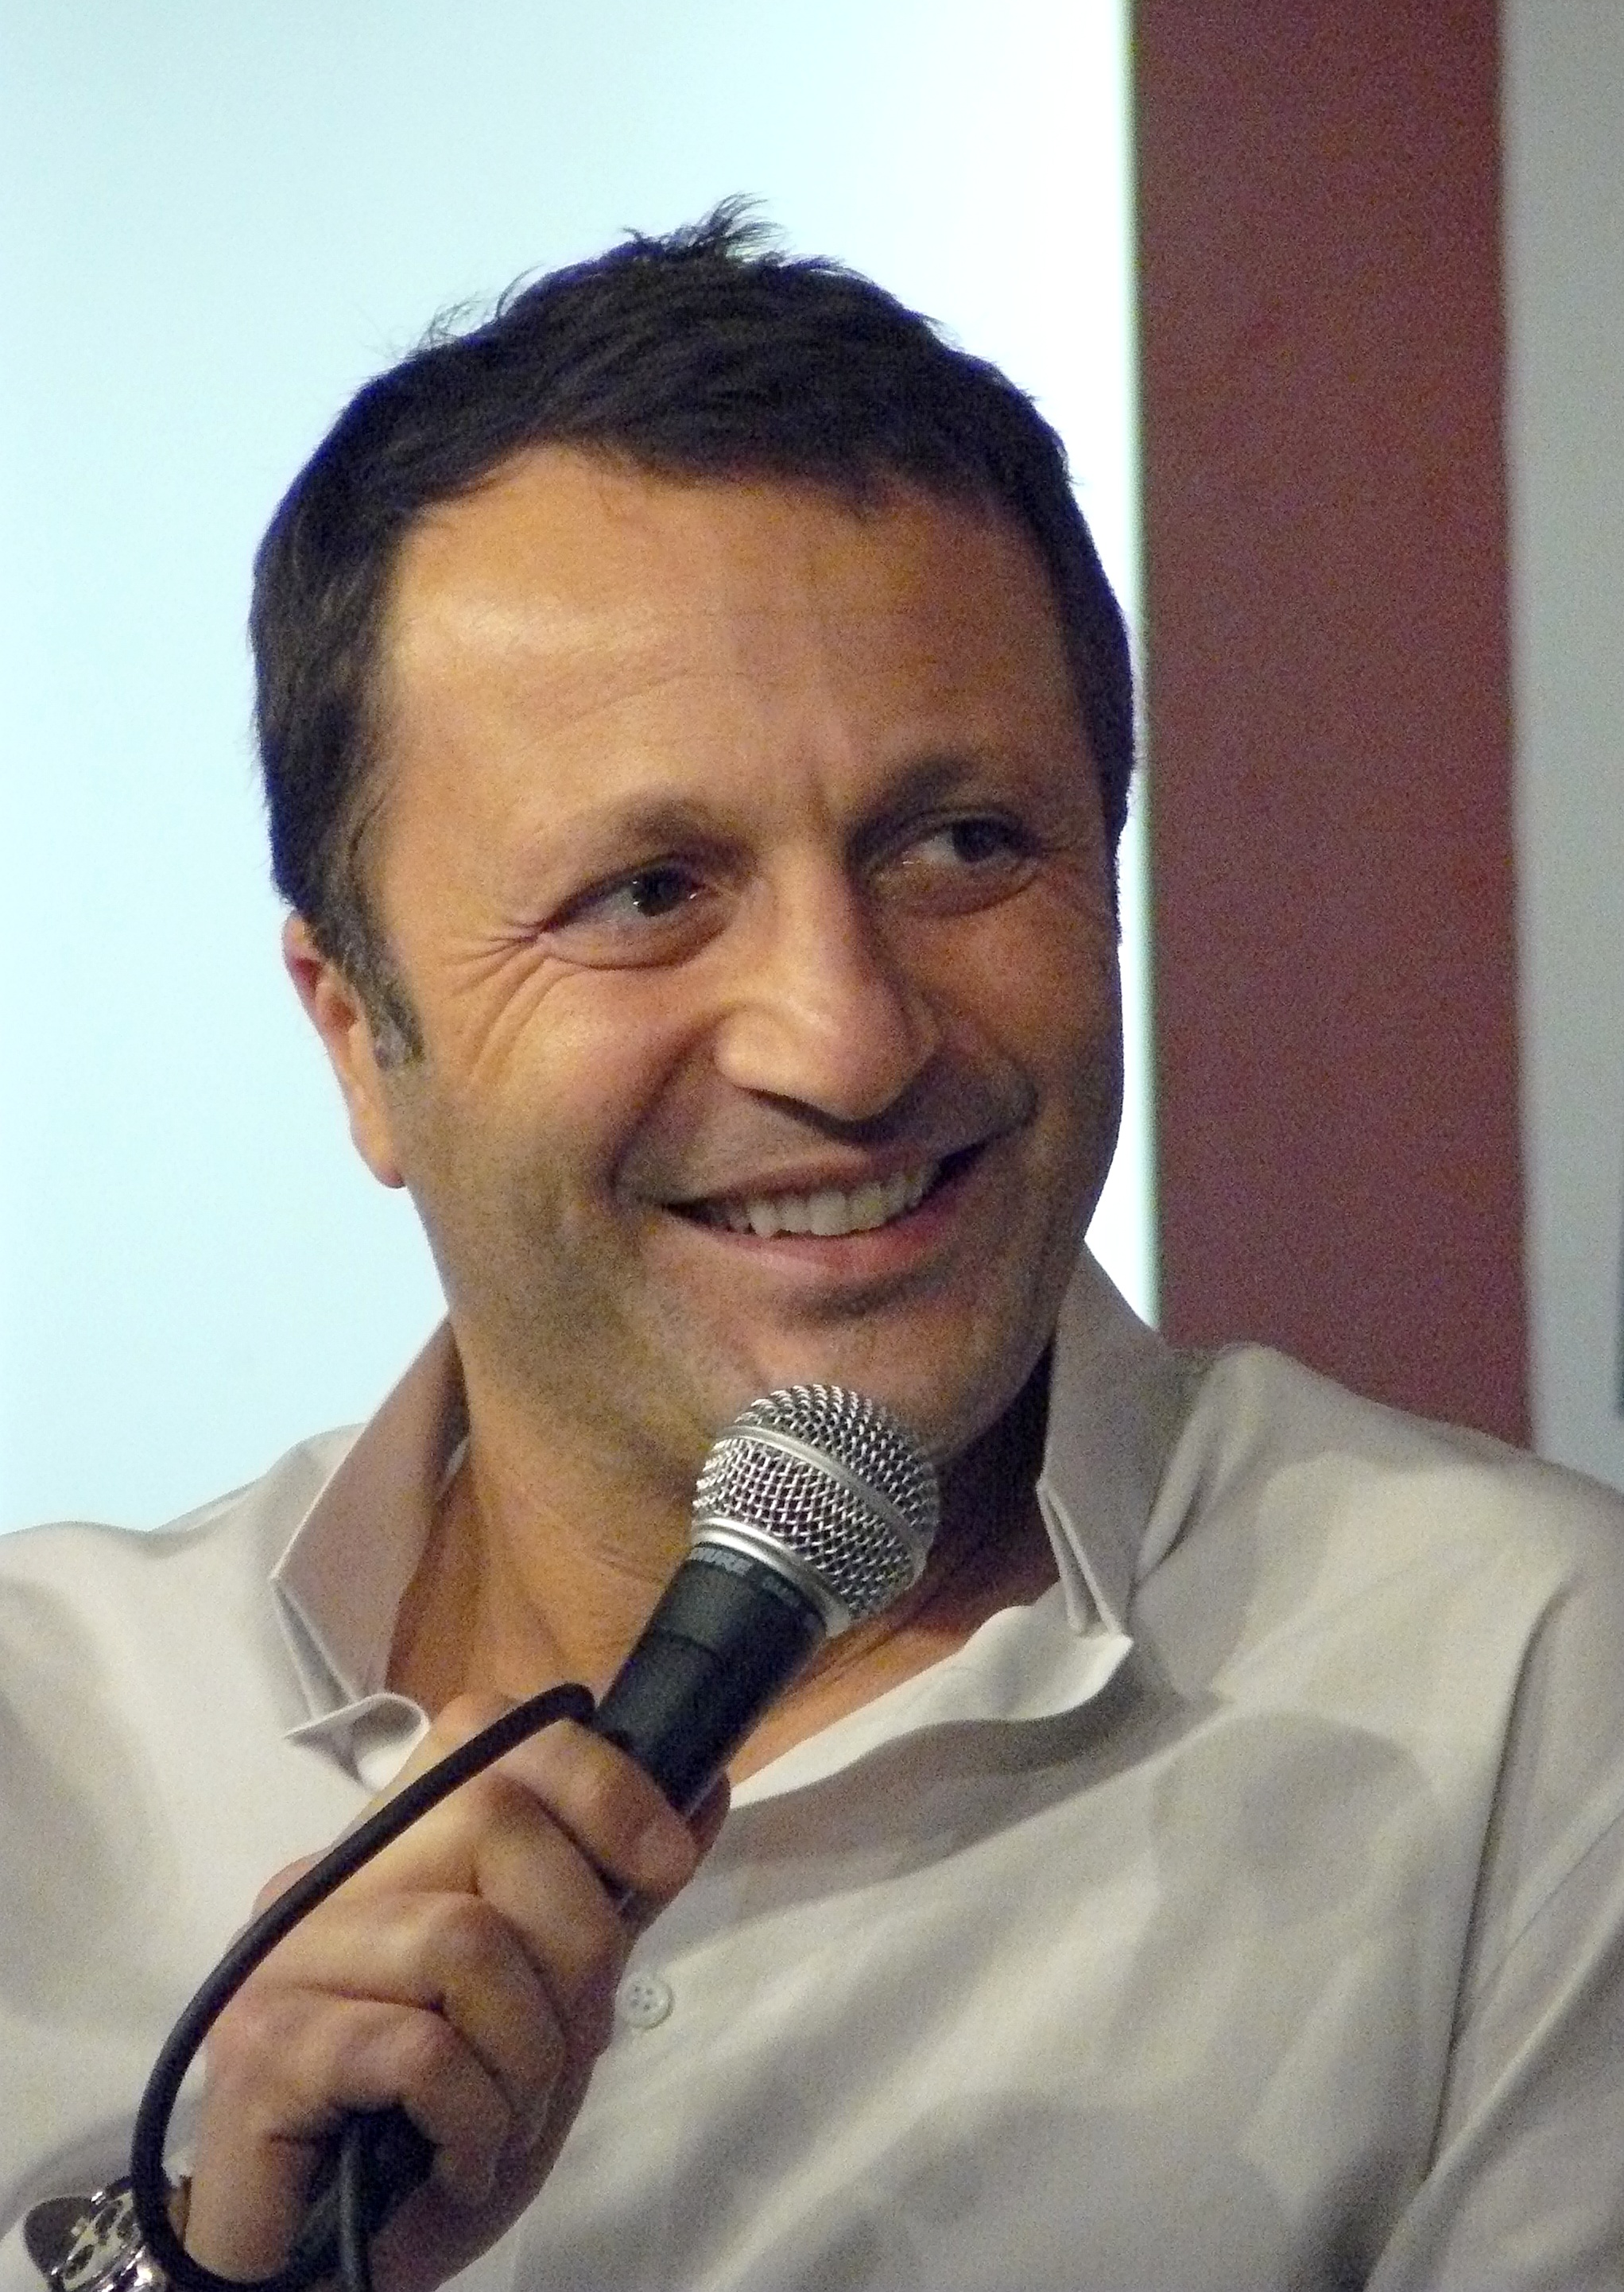 arthur tv presenter wikipedia